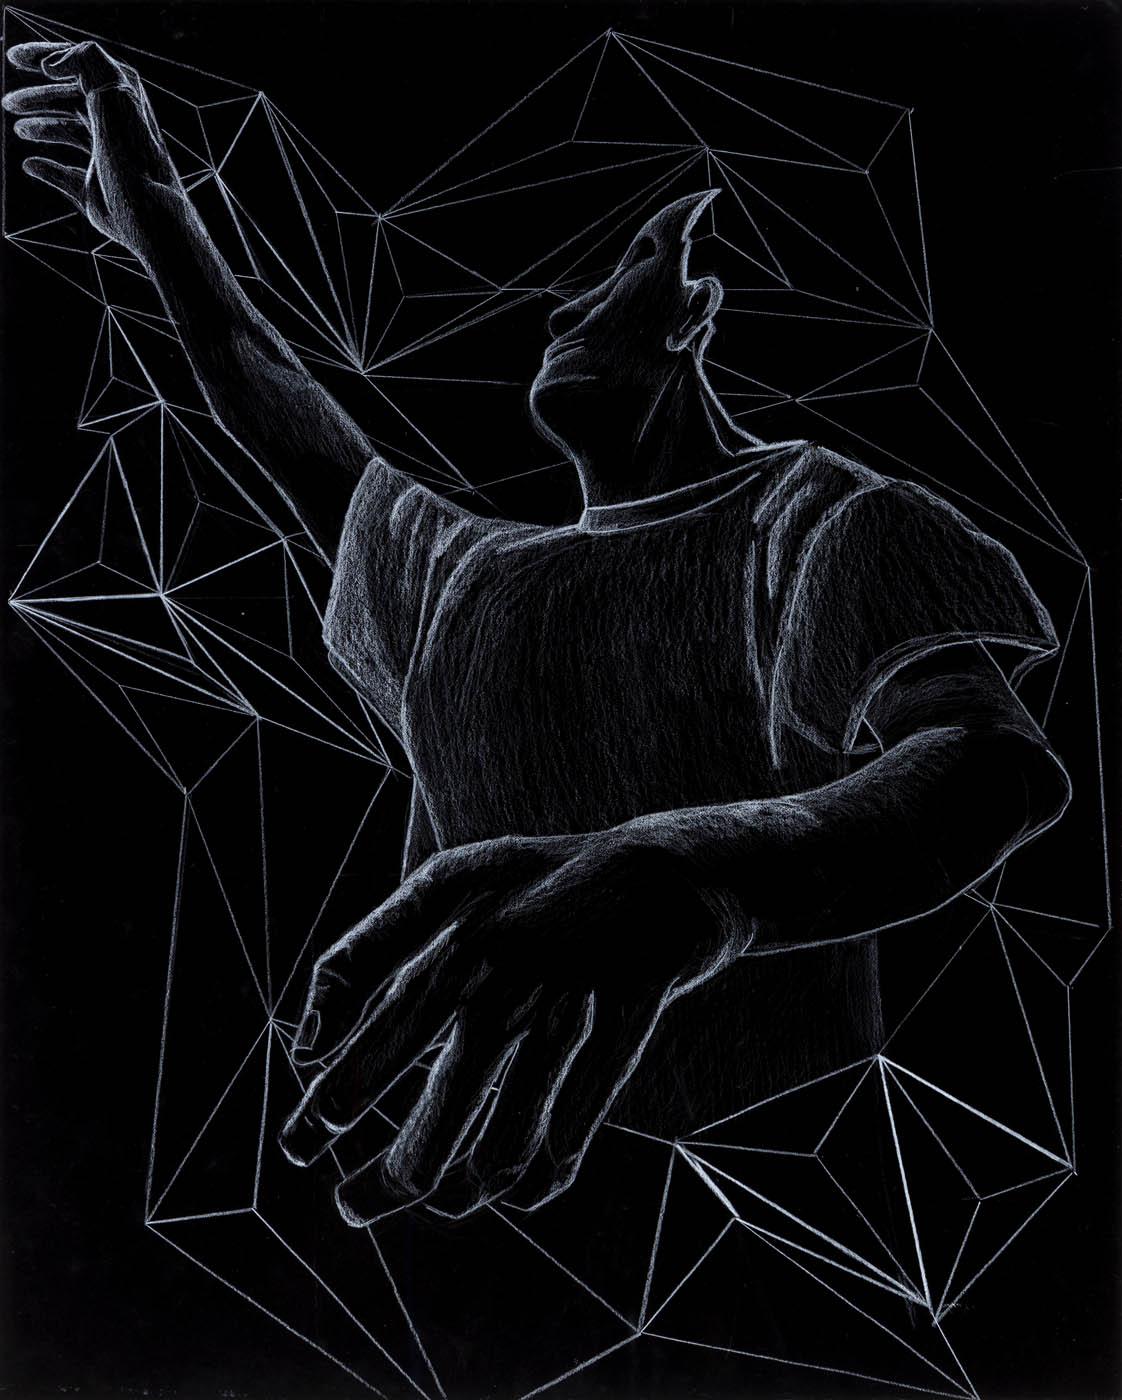 Madison A. Castellano - Schizophrenia